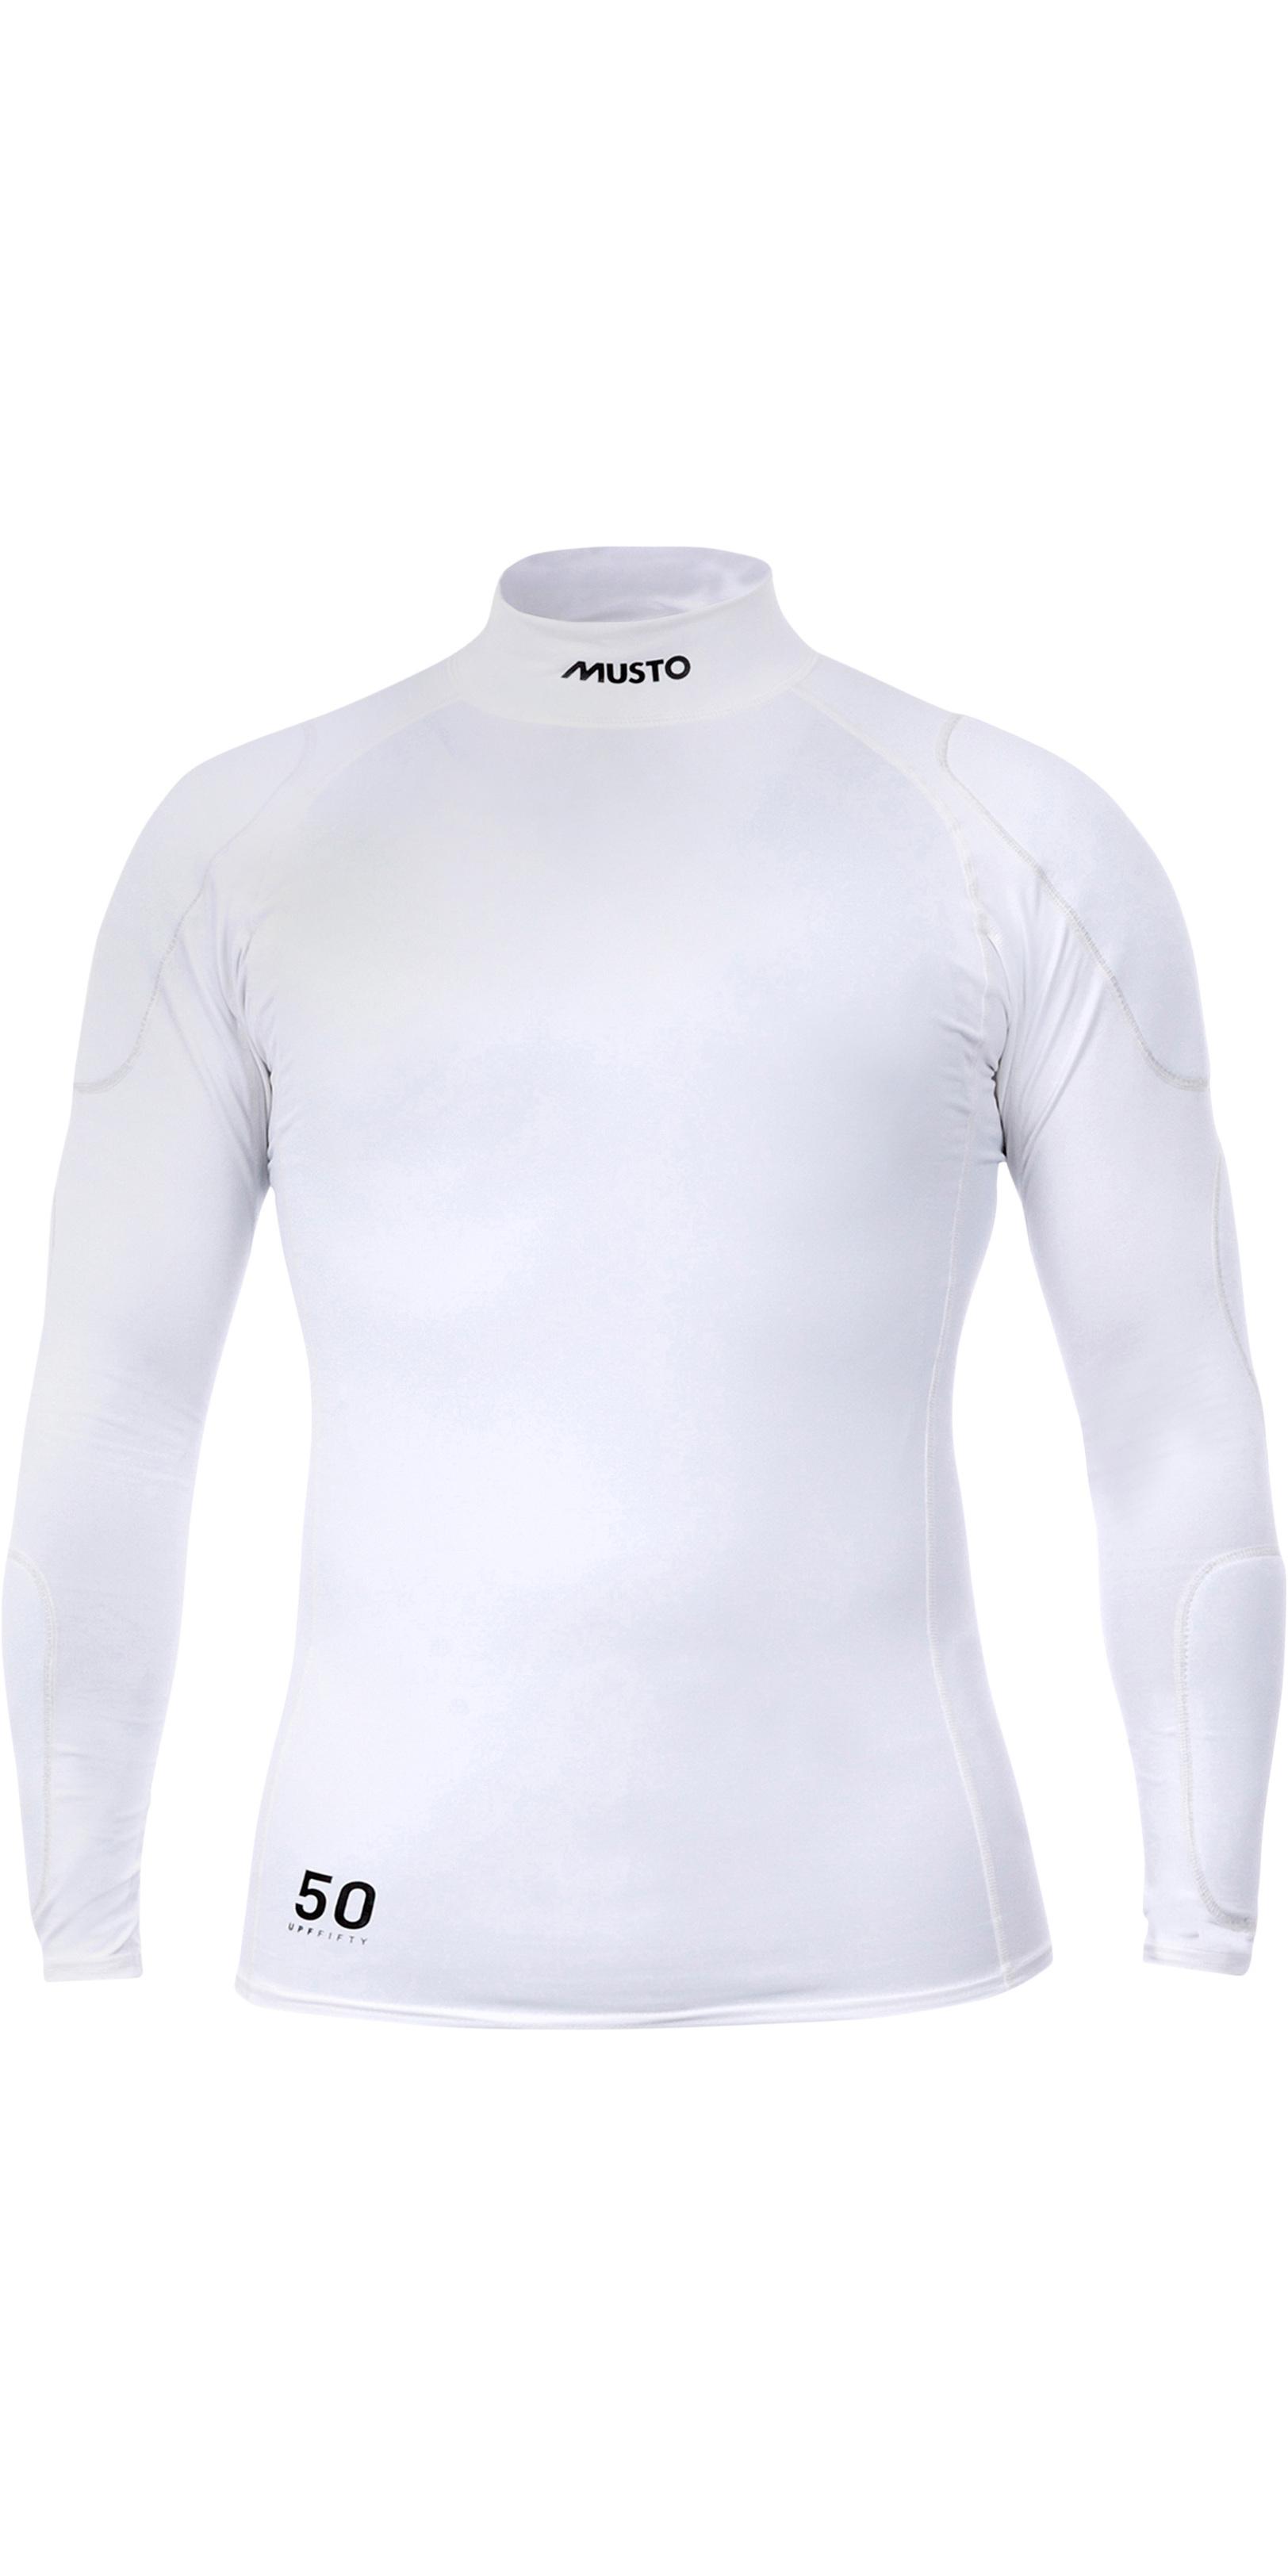 2019 Musto Mens Foiling Sunblock Impact Top White SMTS014